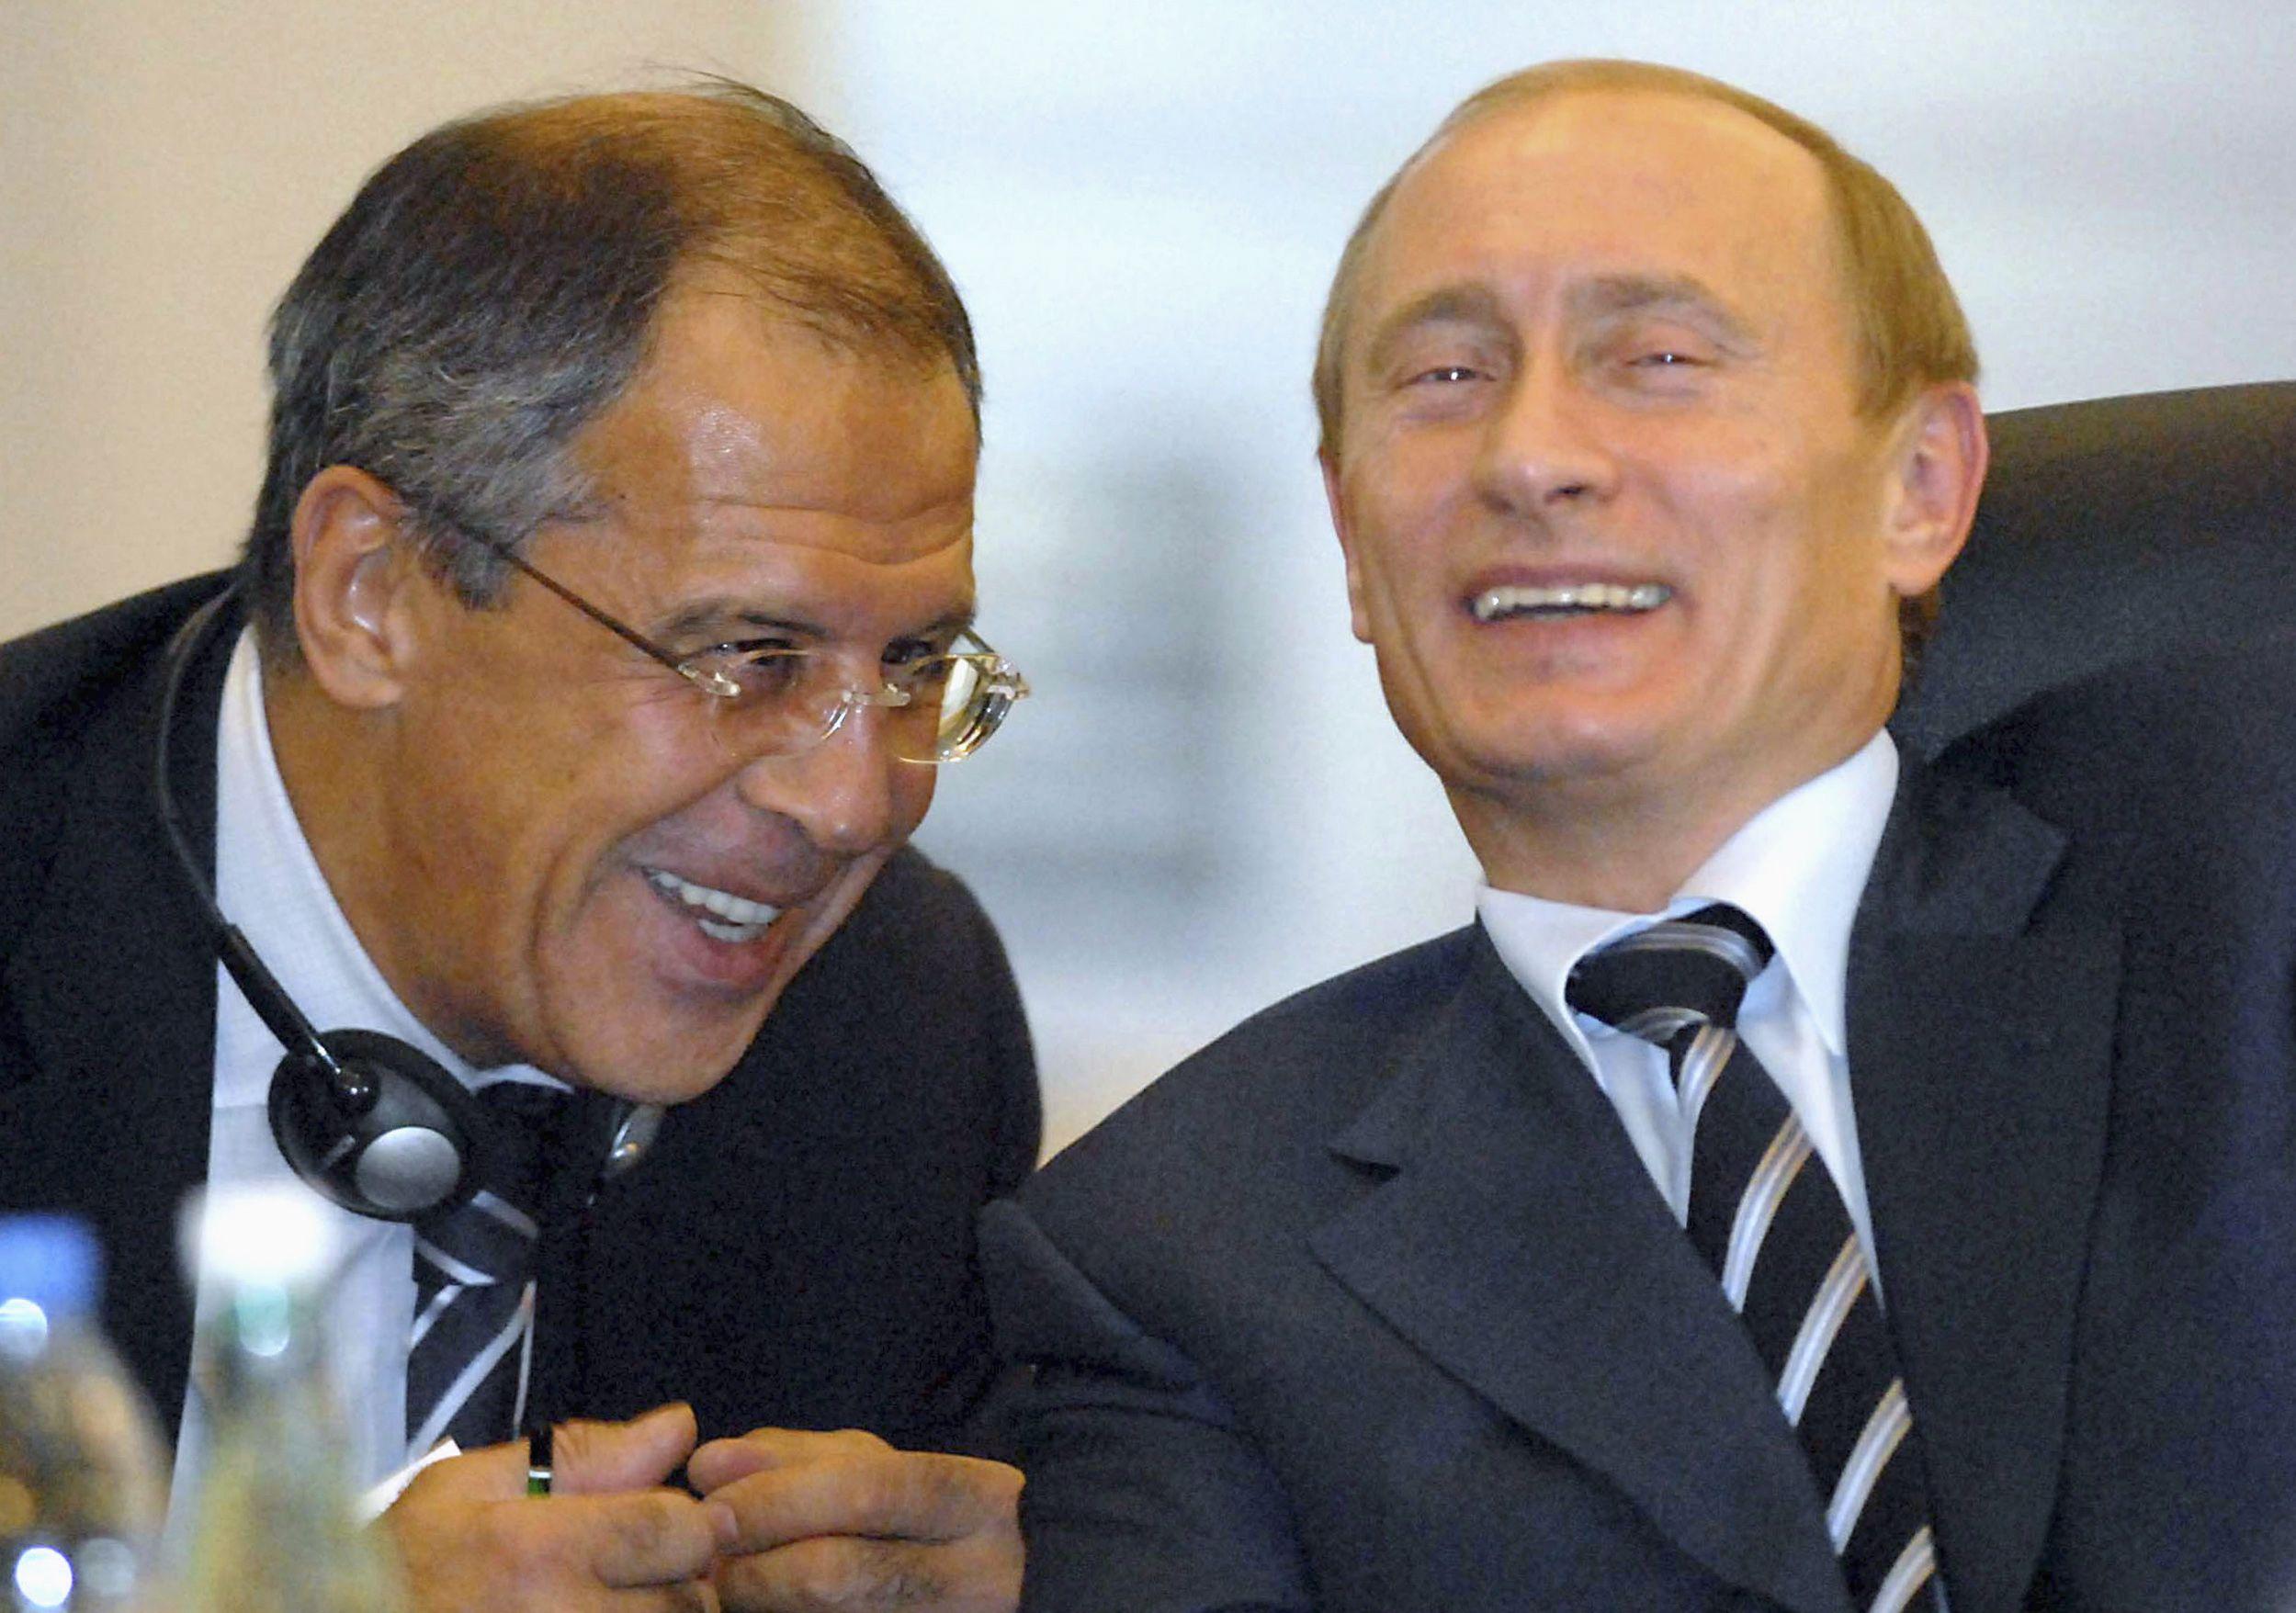 Lavrov and Putin